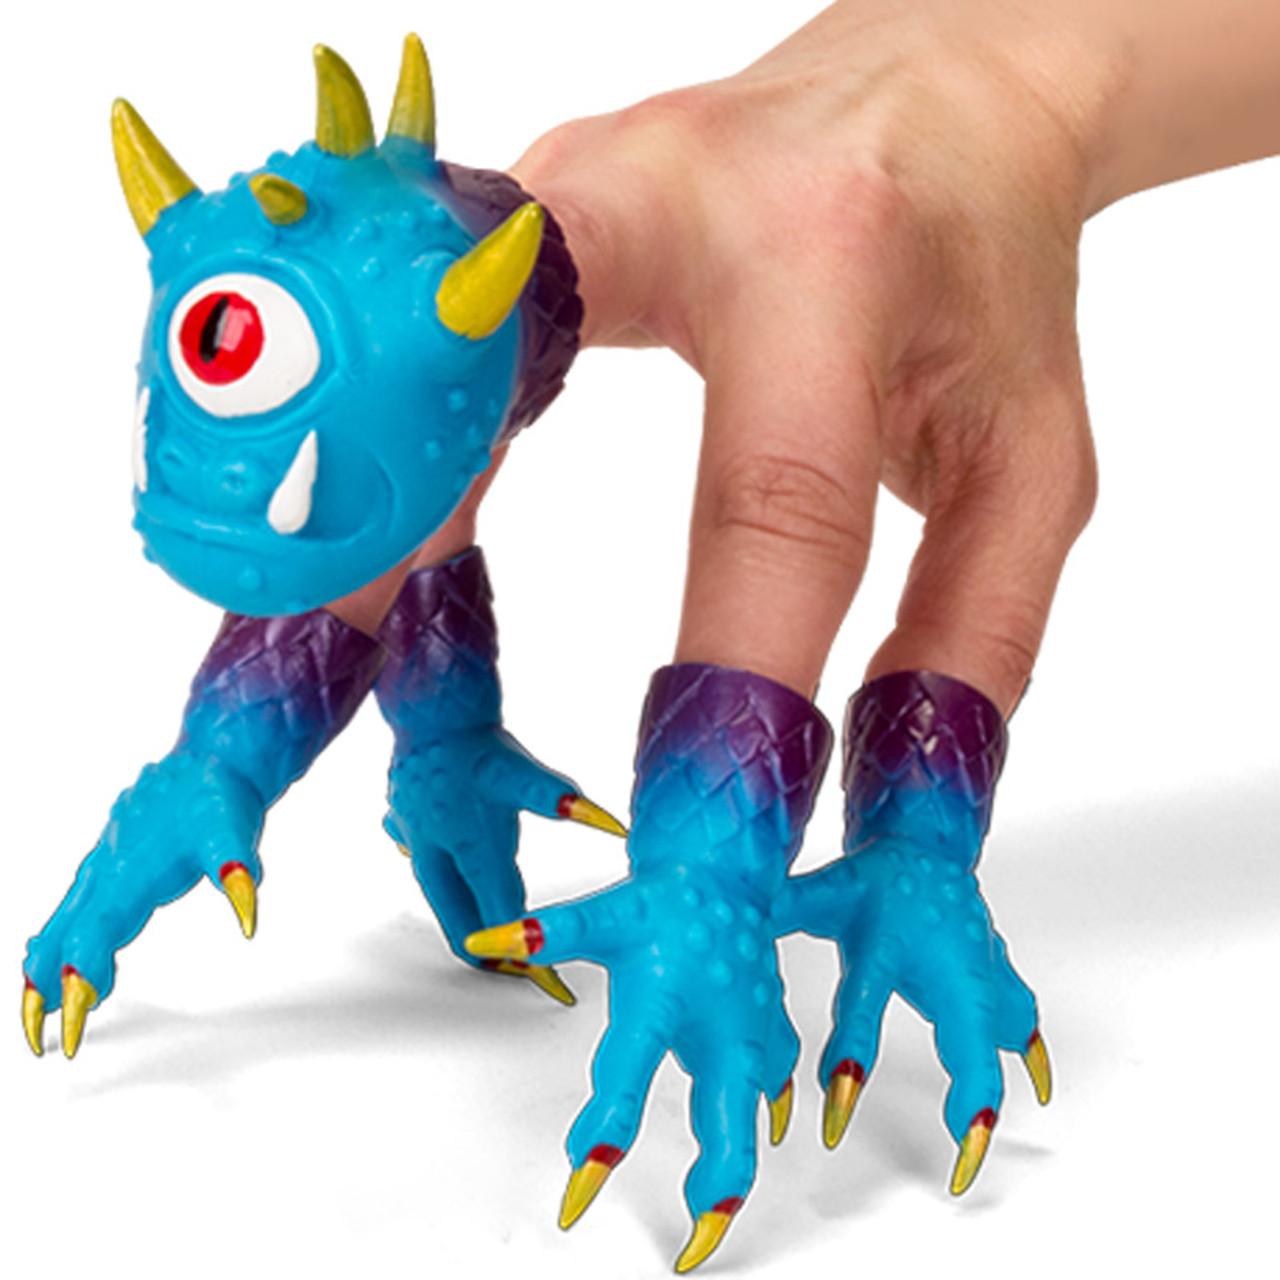 Handimonster